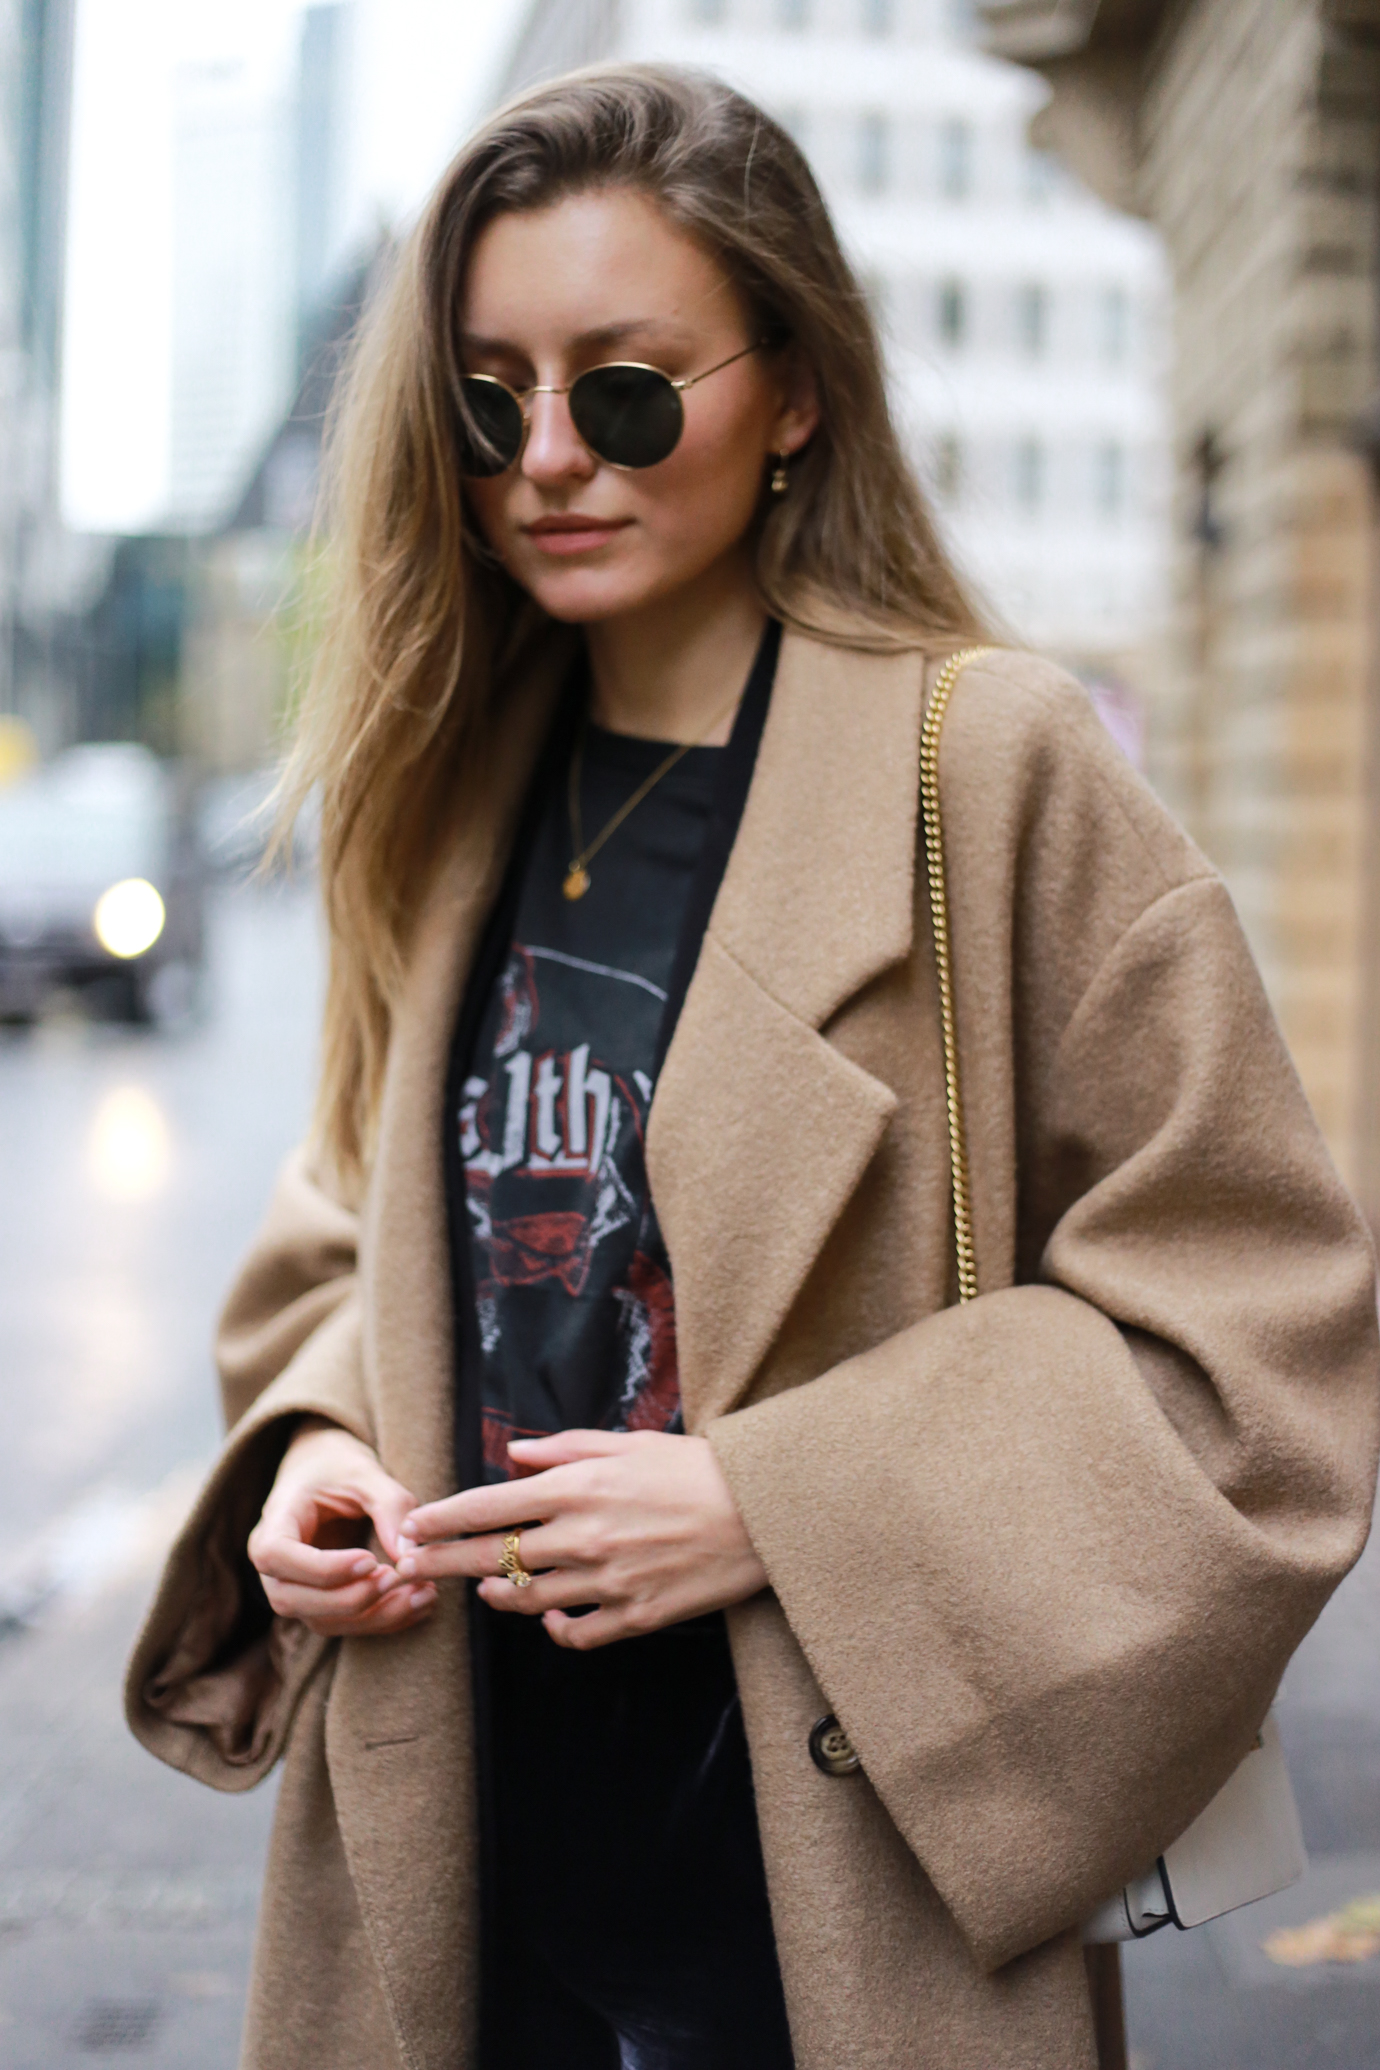 velvet-band-shirt-camel-coat-outfit-livia-auer-6557